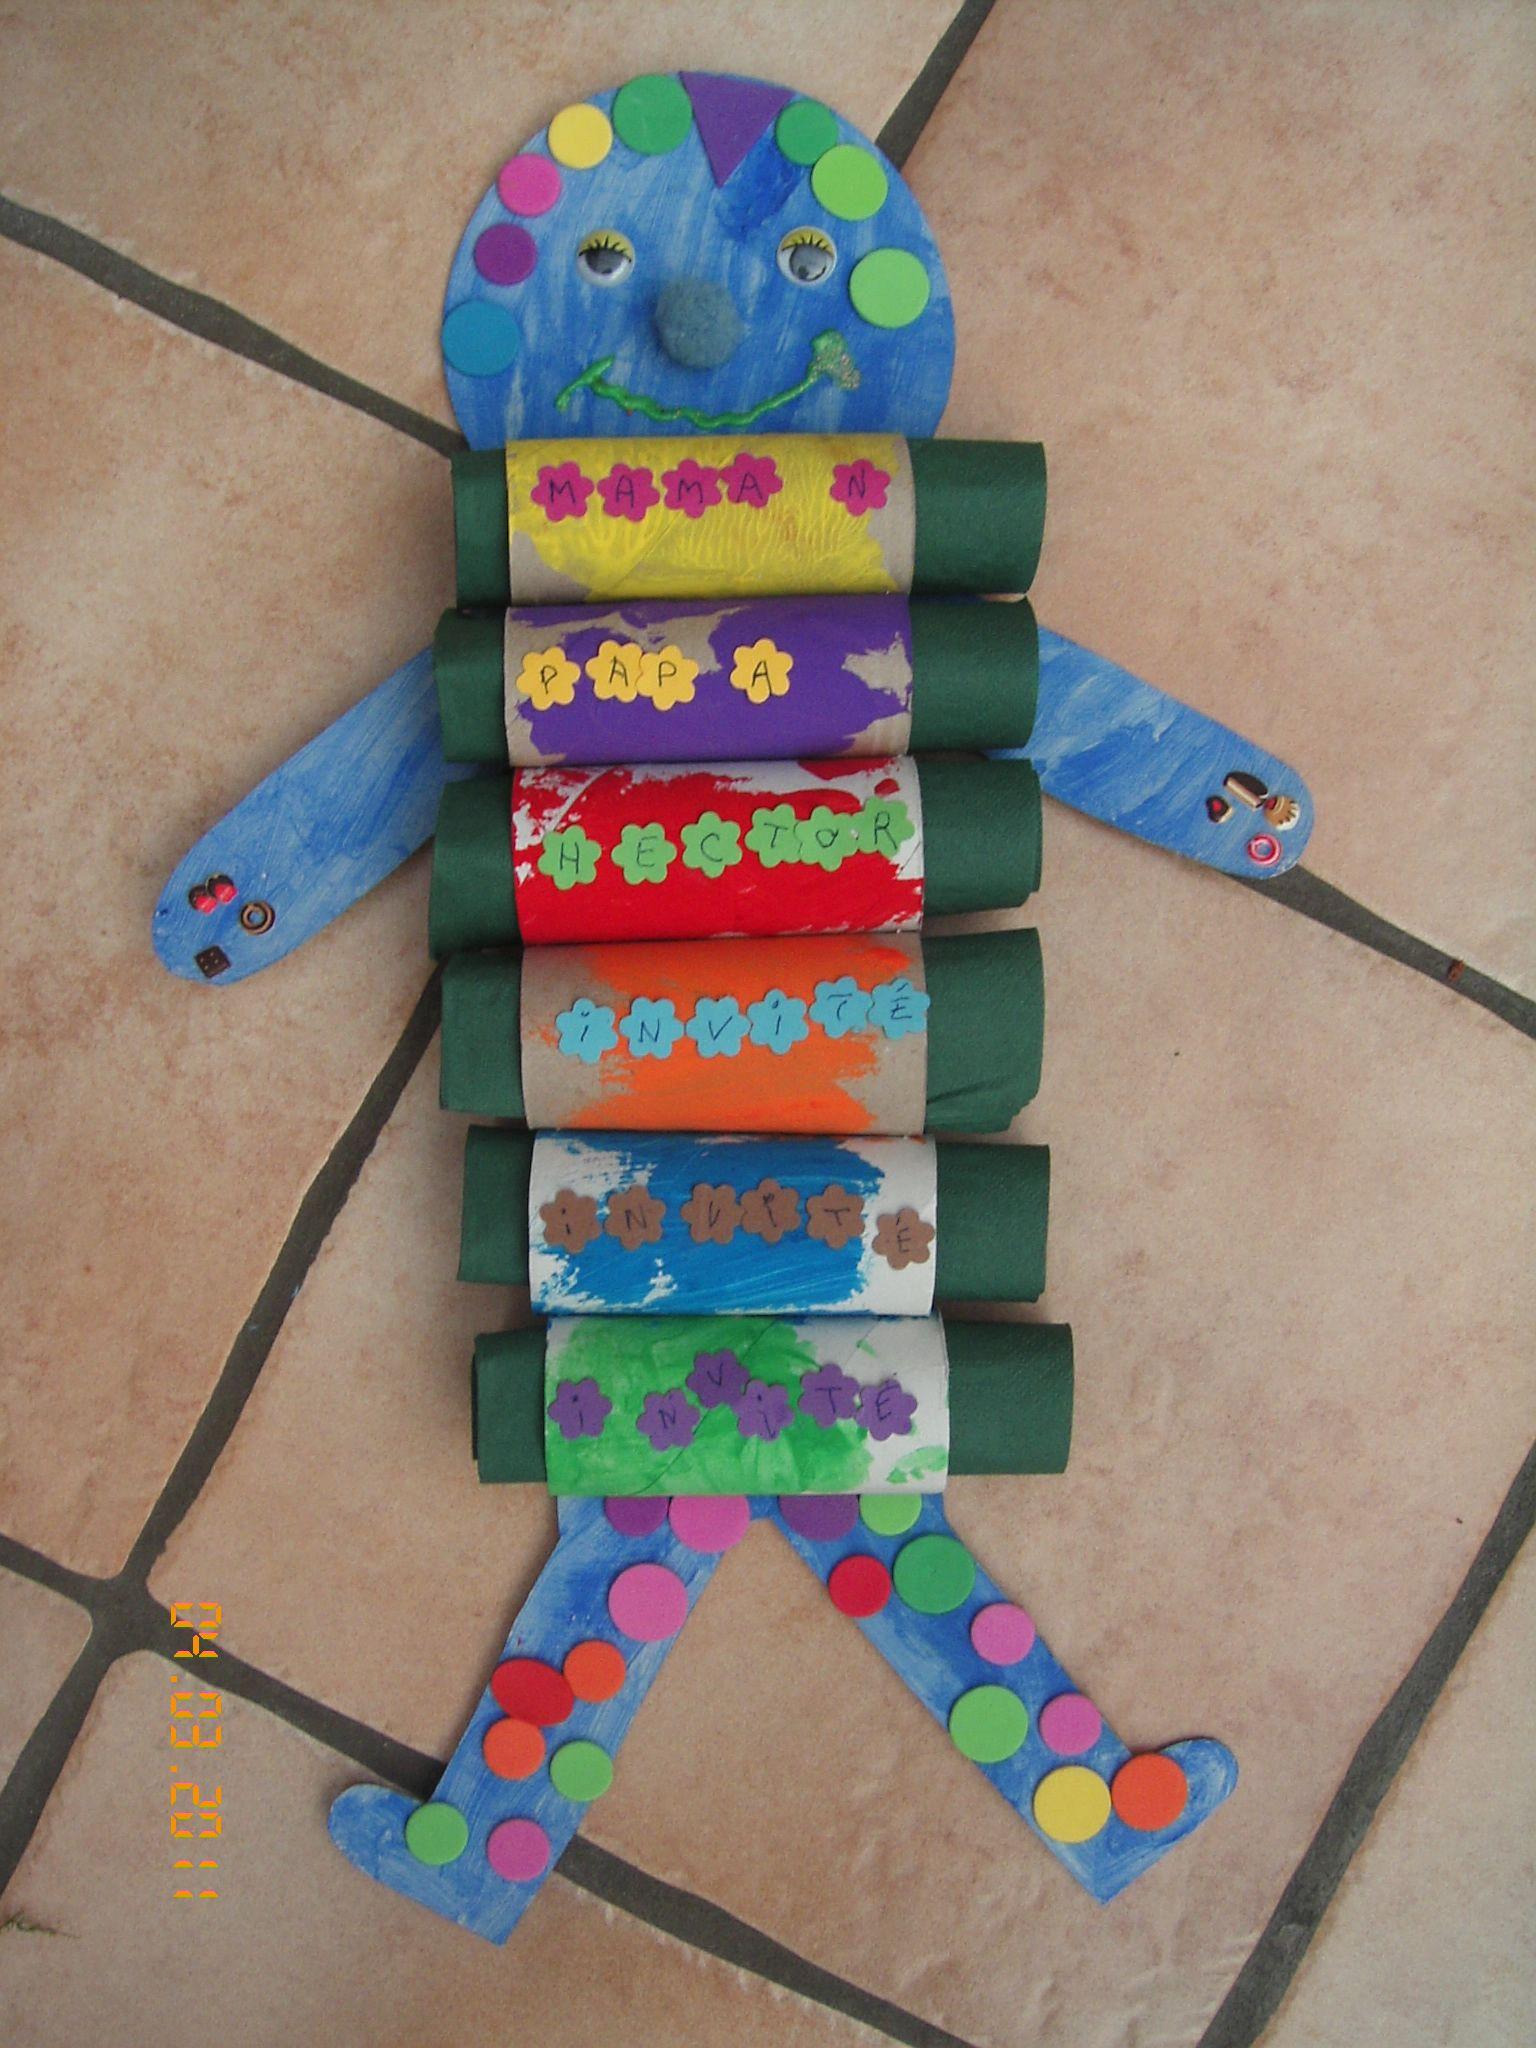 Bricolage avec objets recycles - Recyclage activite manuelle ...